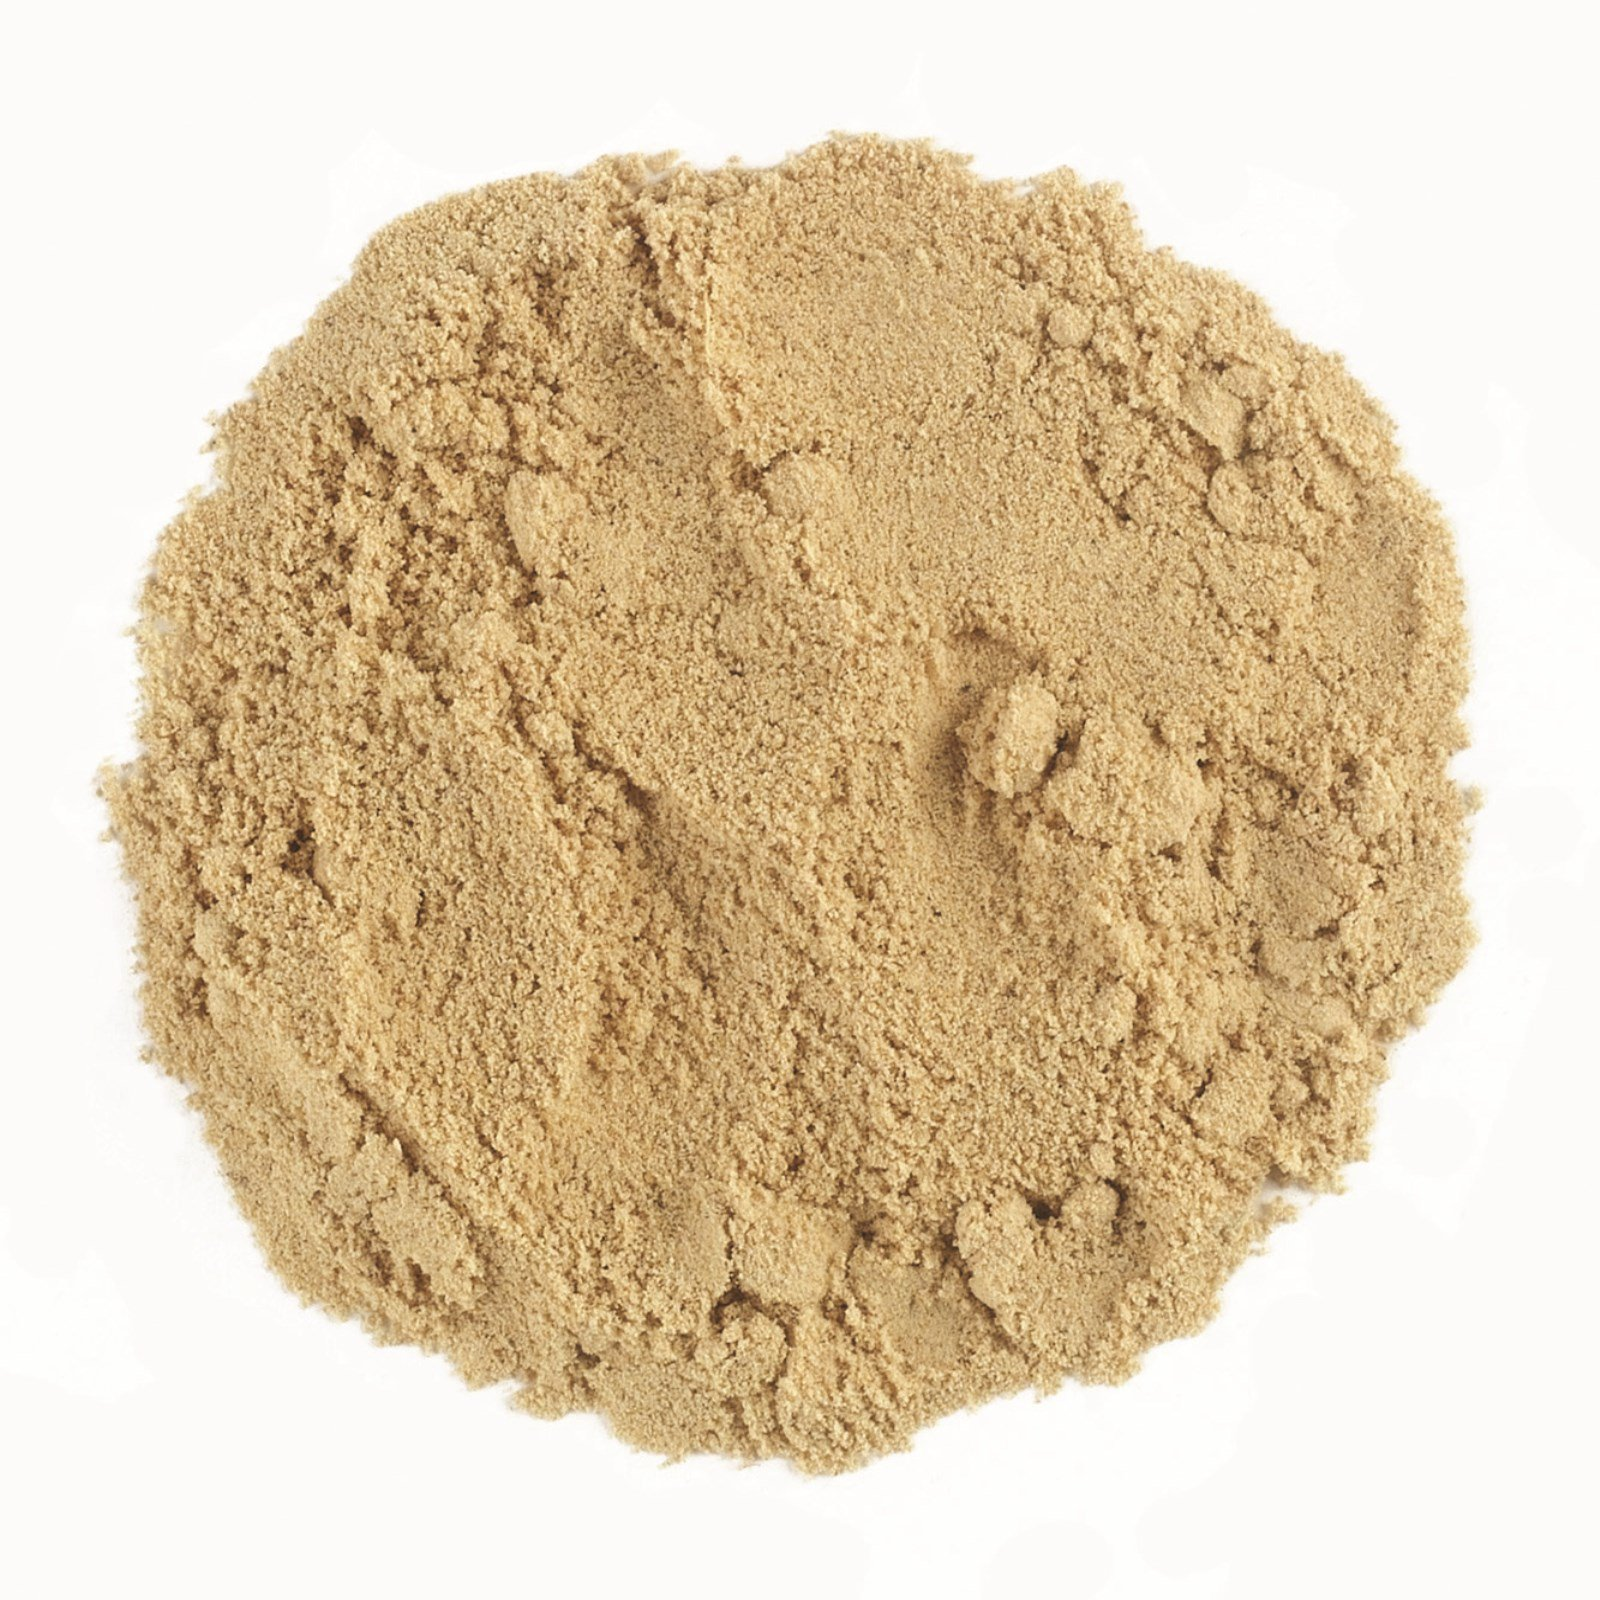 Frontier Natural Products, Органический молотый корень имбиря, 16 унций (453 г)